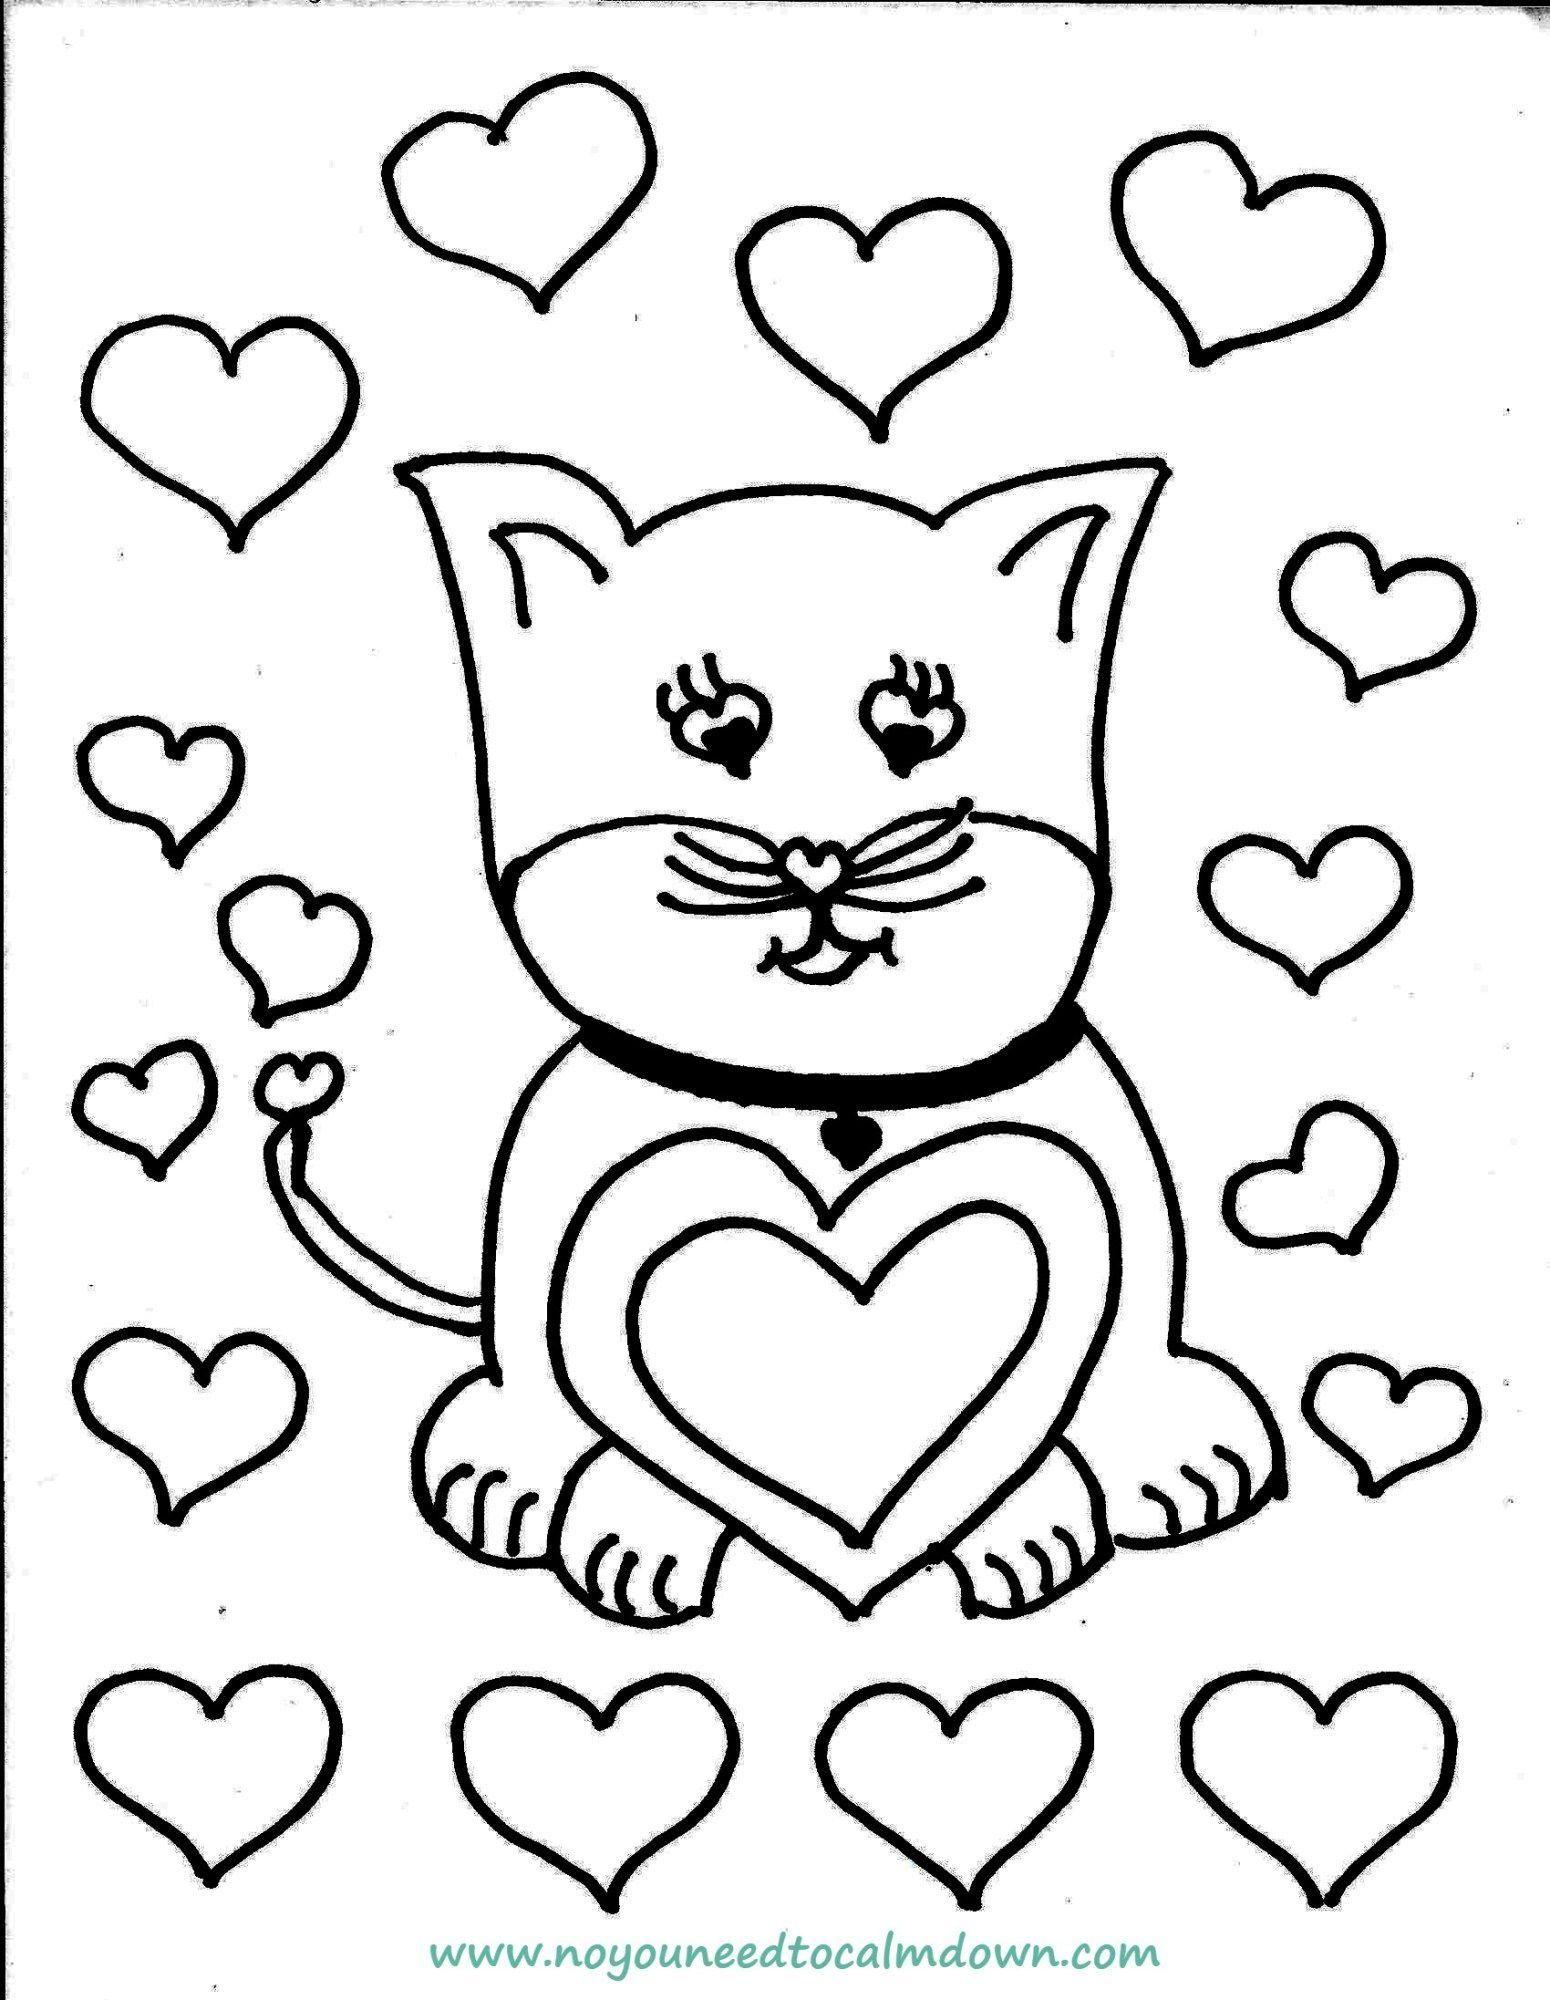 8 Unicorn Valentine Coloring Page Valentines Day Coloring Page Printable Valentines Coloring Pages Valentine Coloring